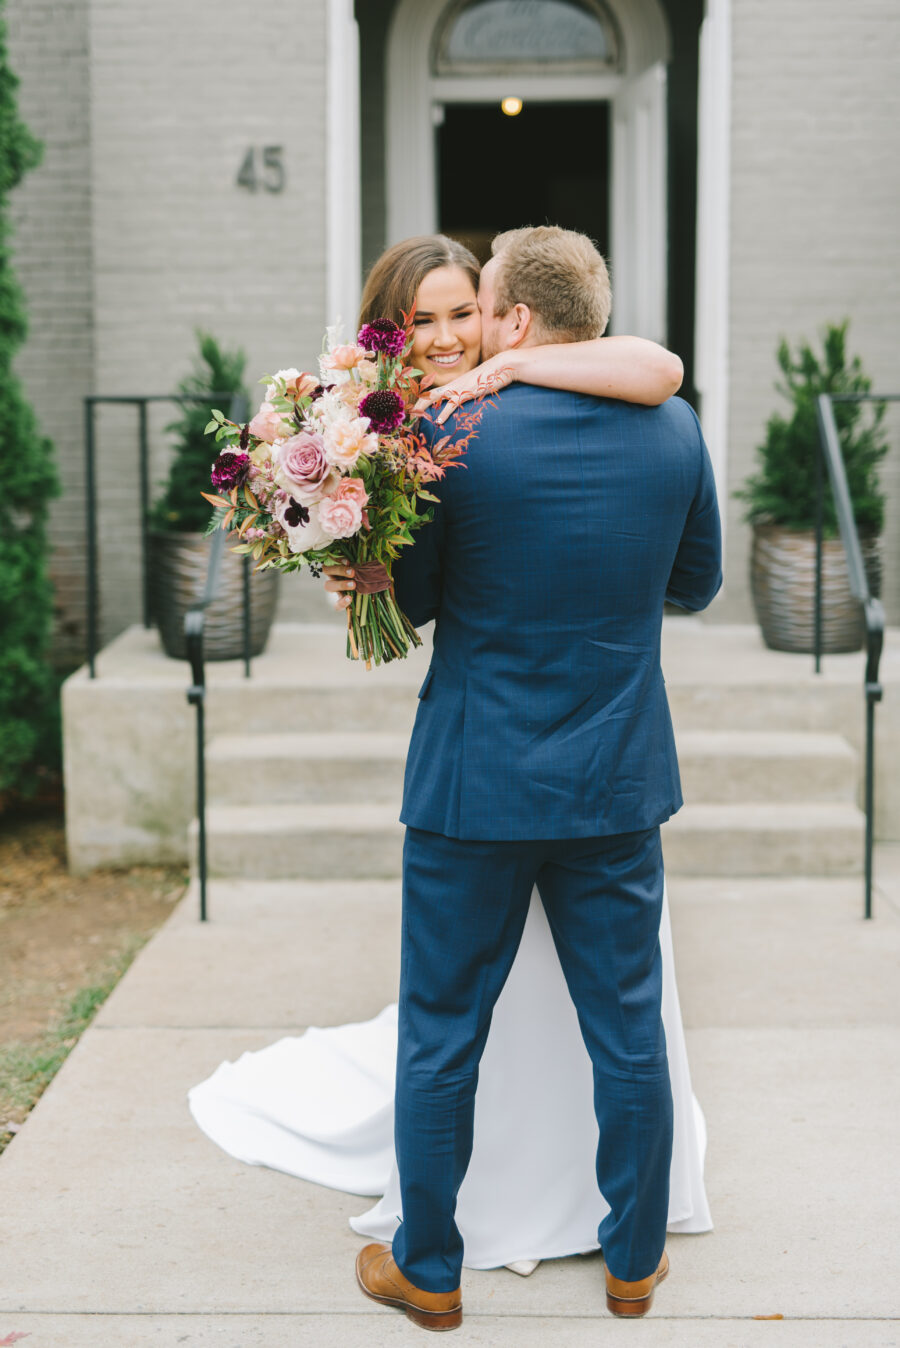 Nashville Wedding Photographer Kera Photography | Nashville Bride Guide